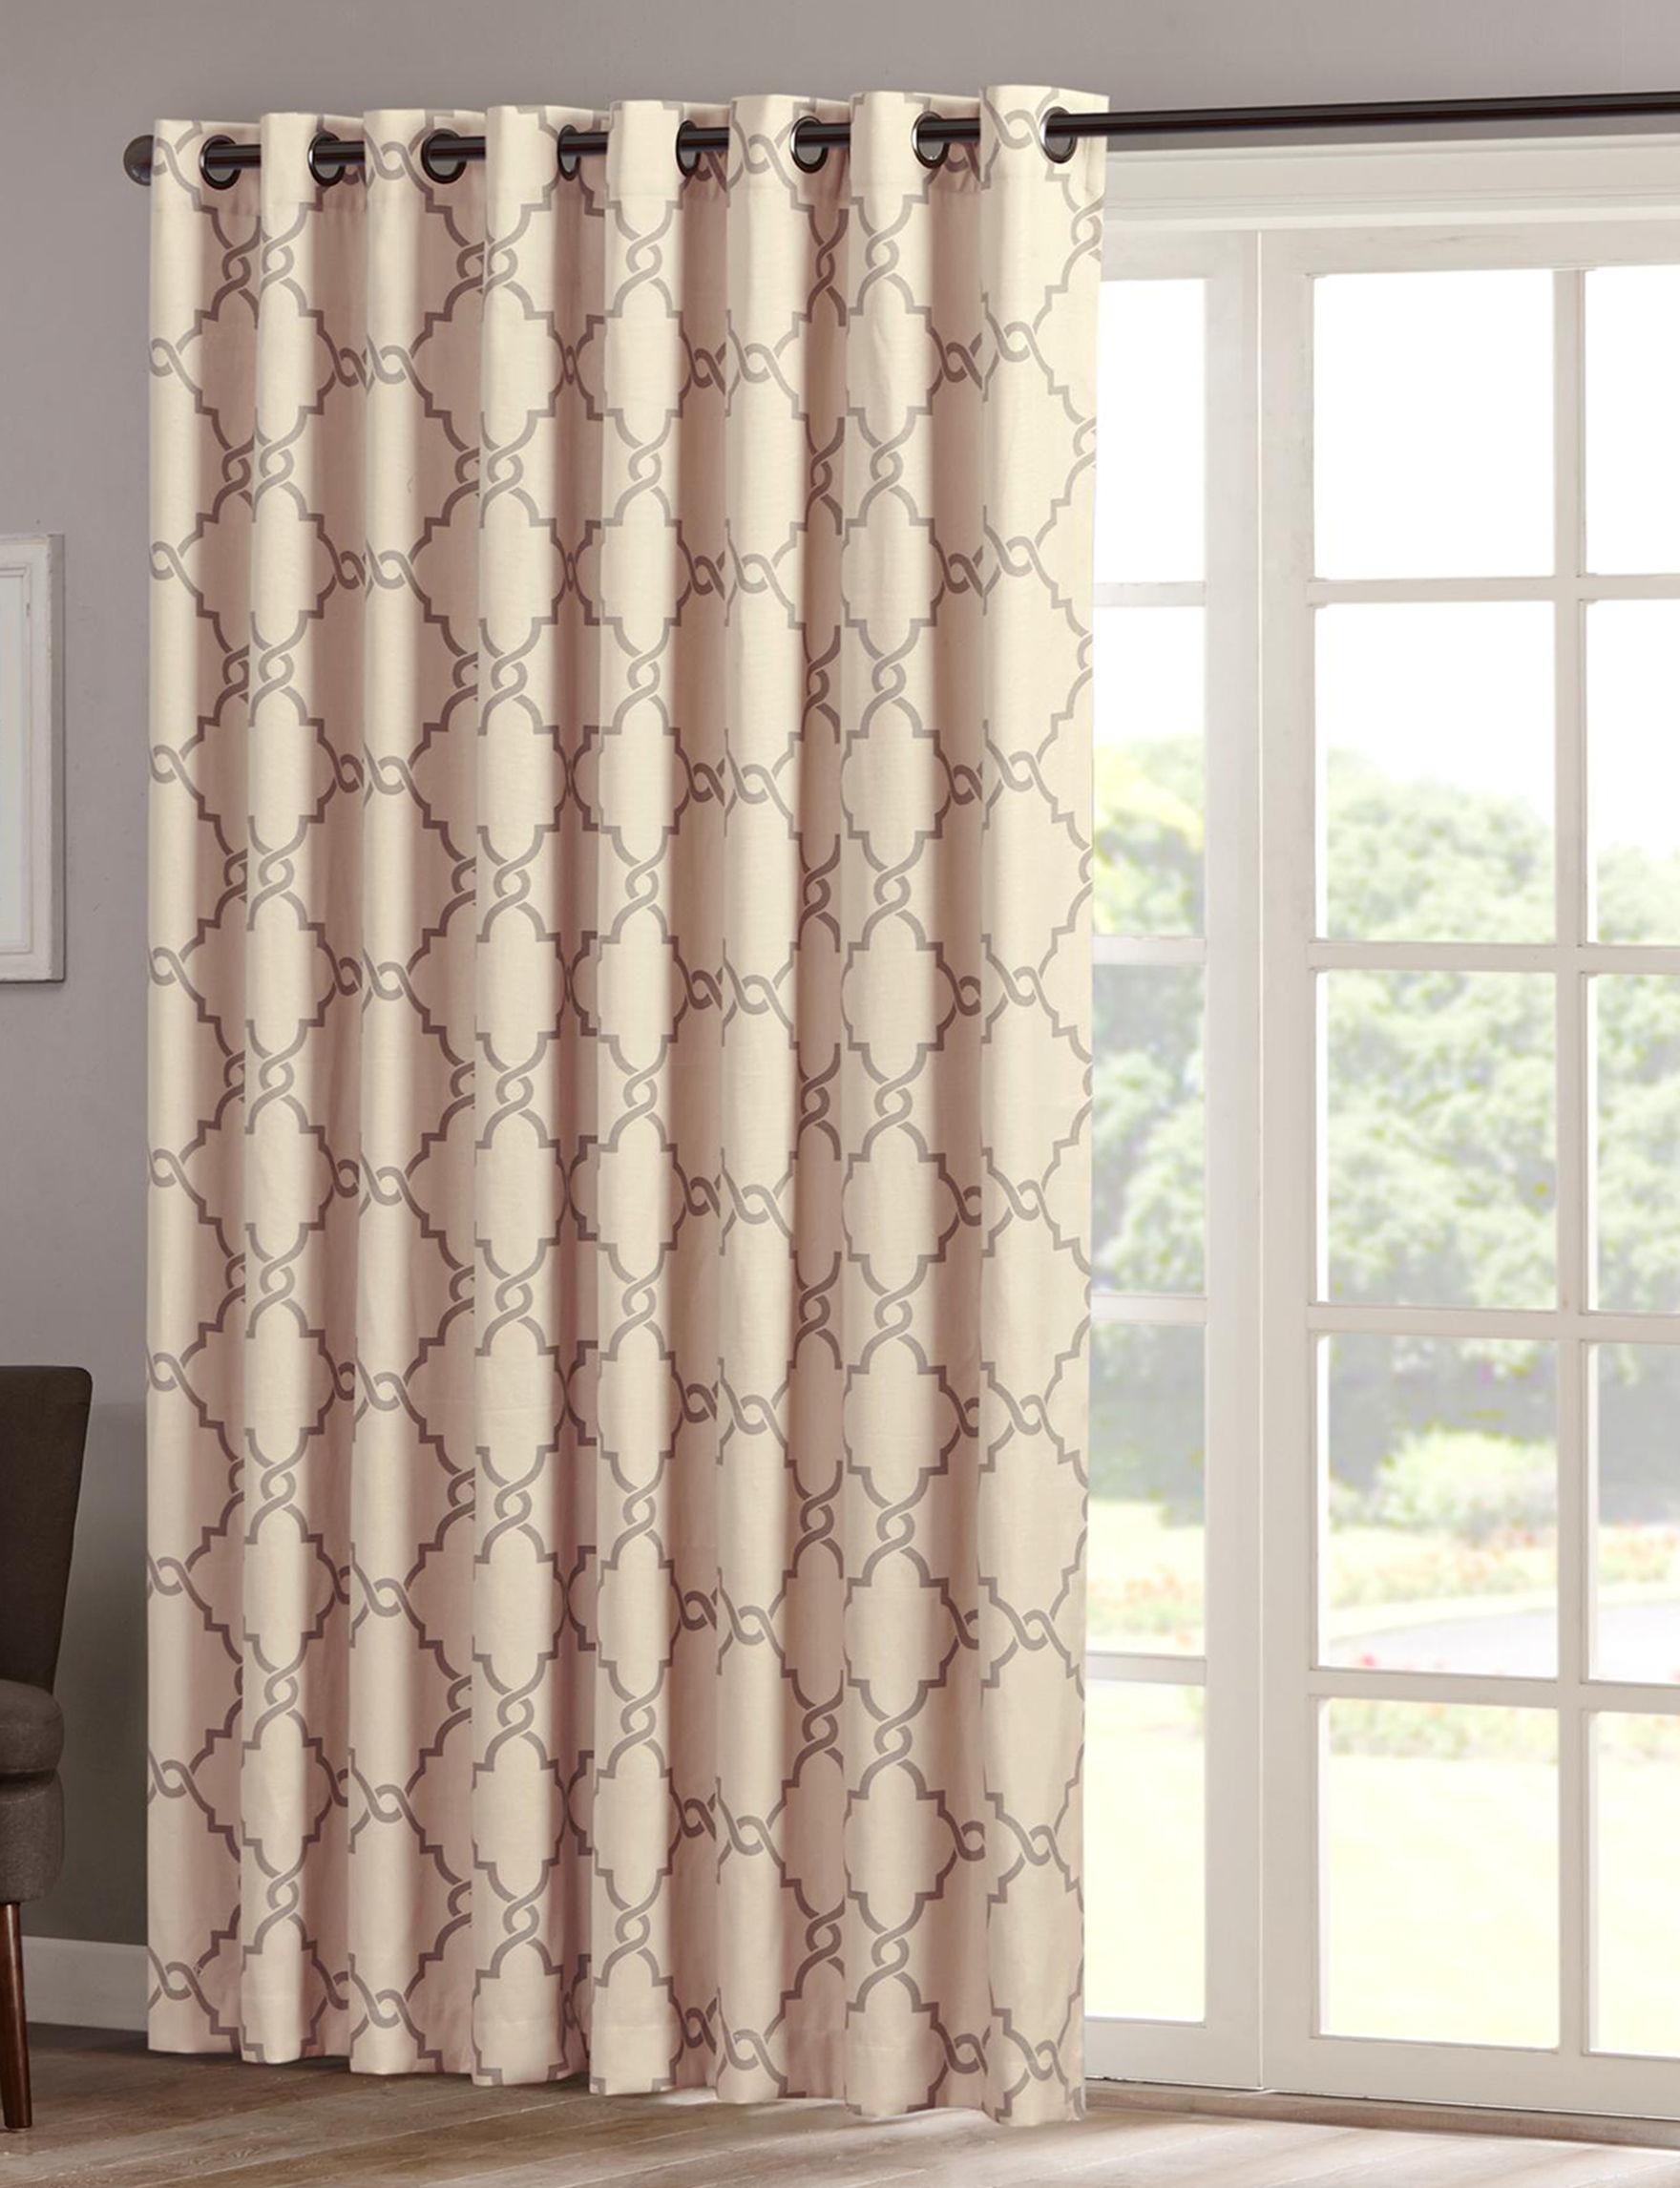 Madison Park Khaki Curtains & Drapes Window Treatments